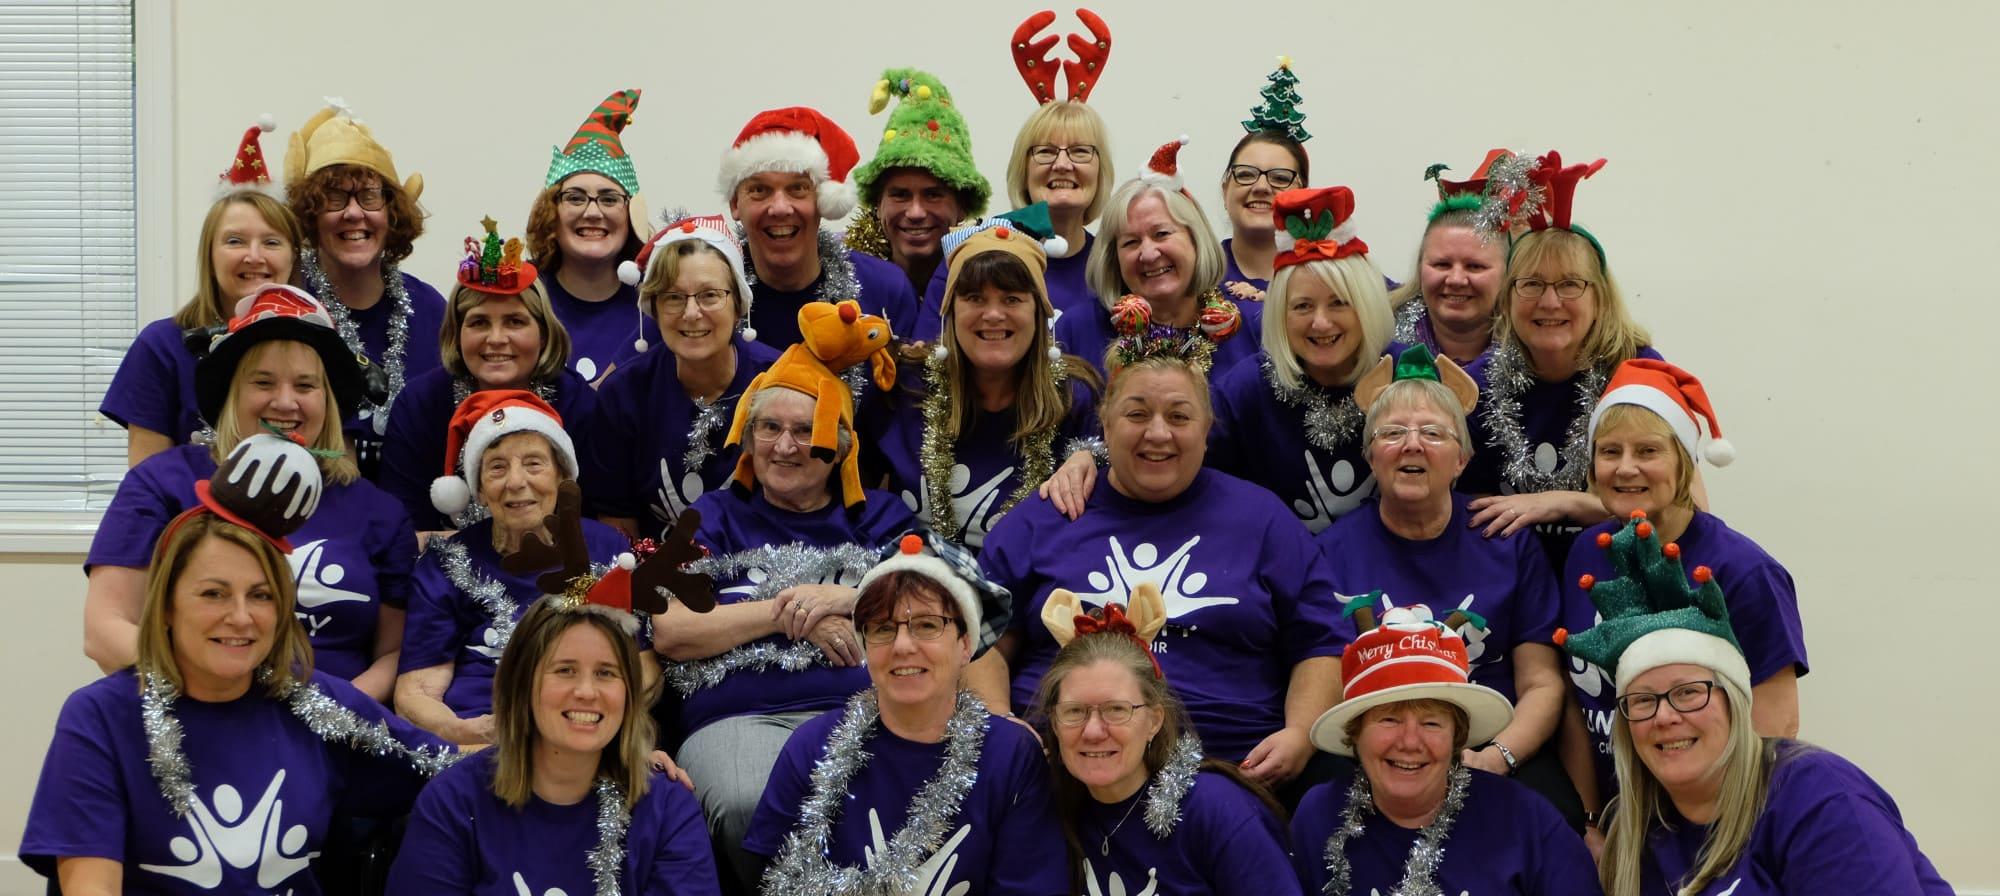 Unity Choir led by The Singing Elf, Christmas Photo Shoot 2018